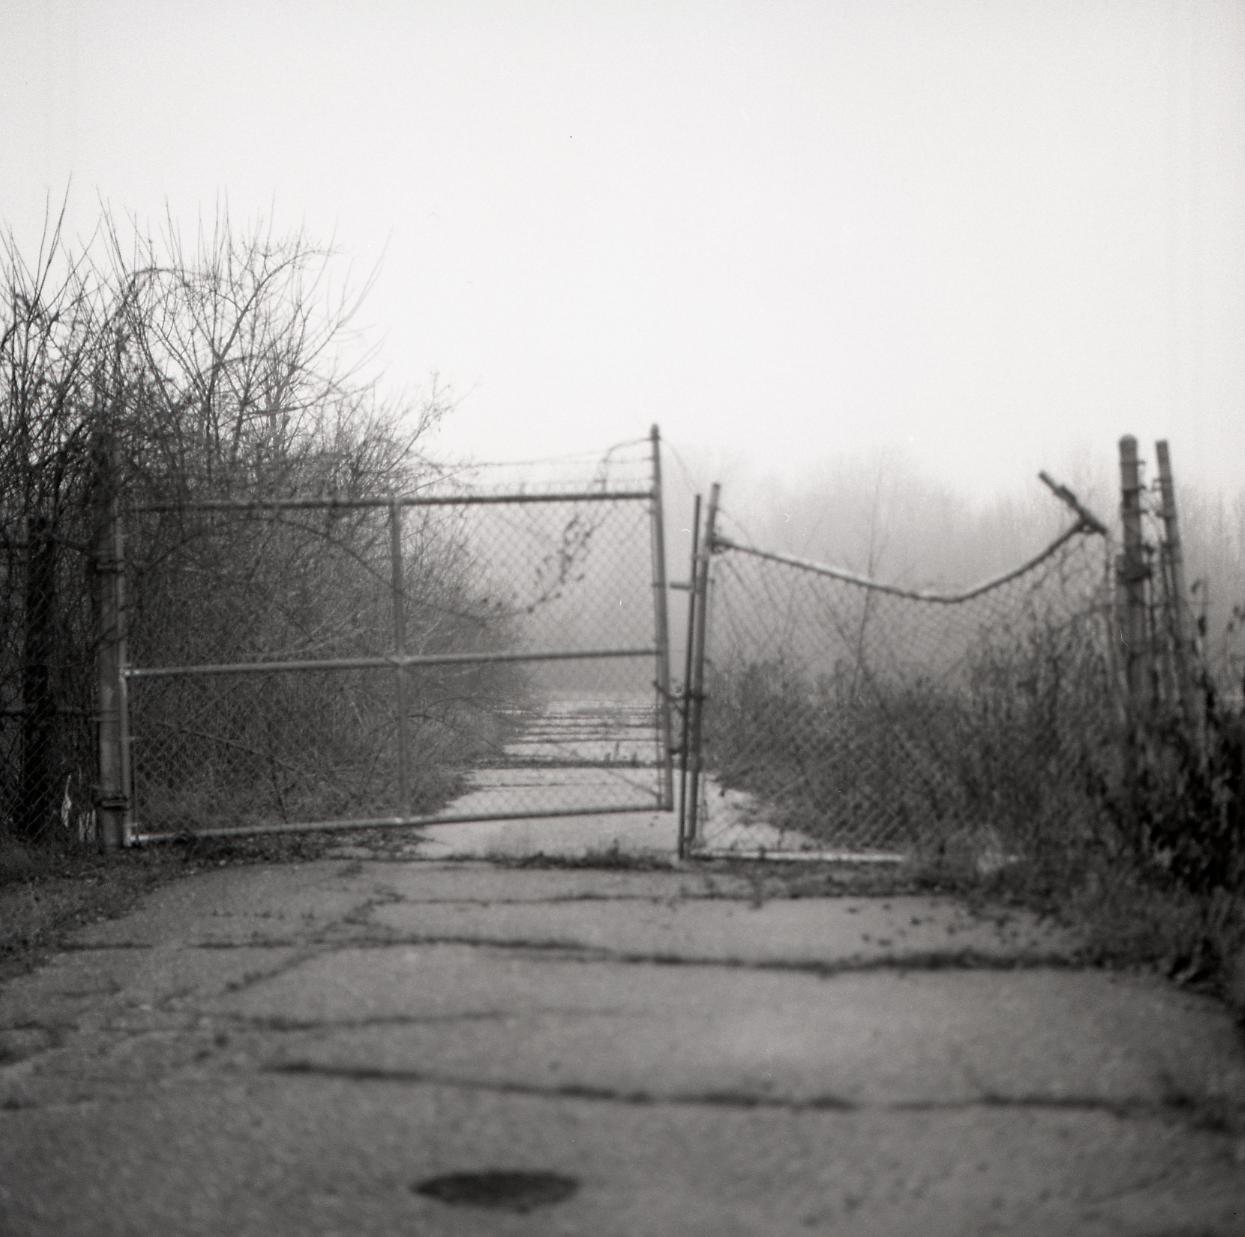 lisbon gate (2 of 3)